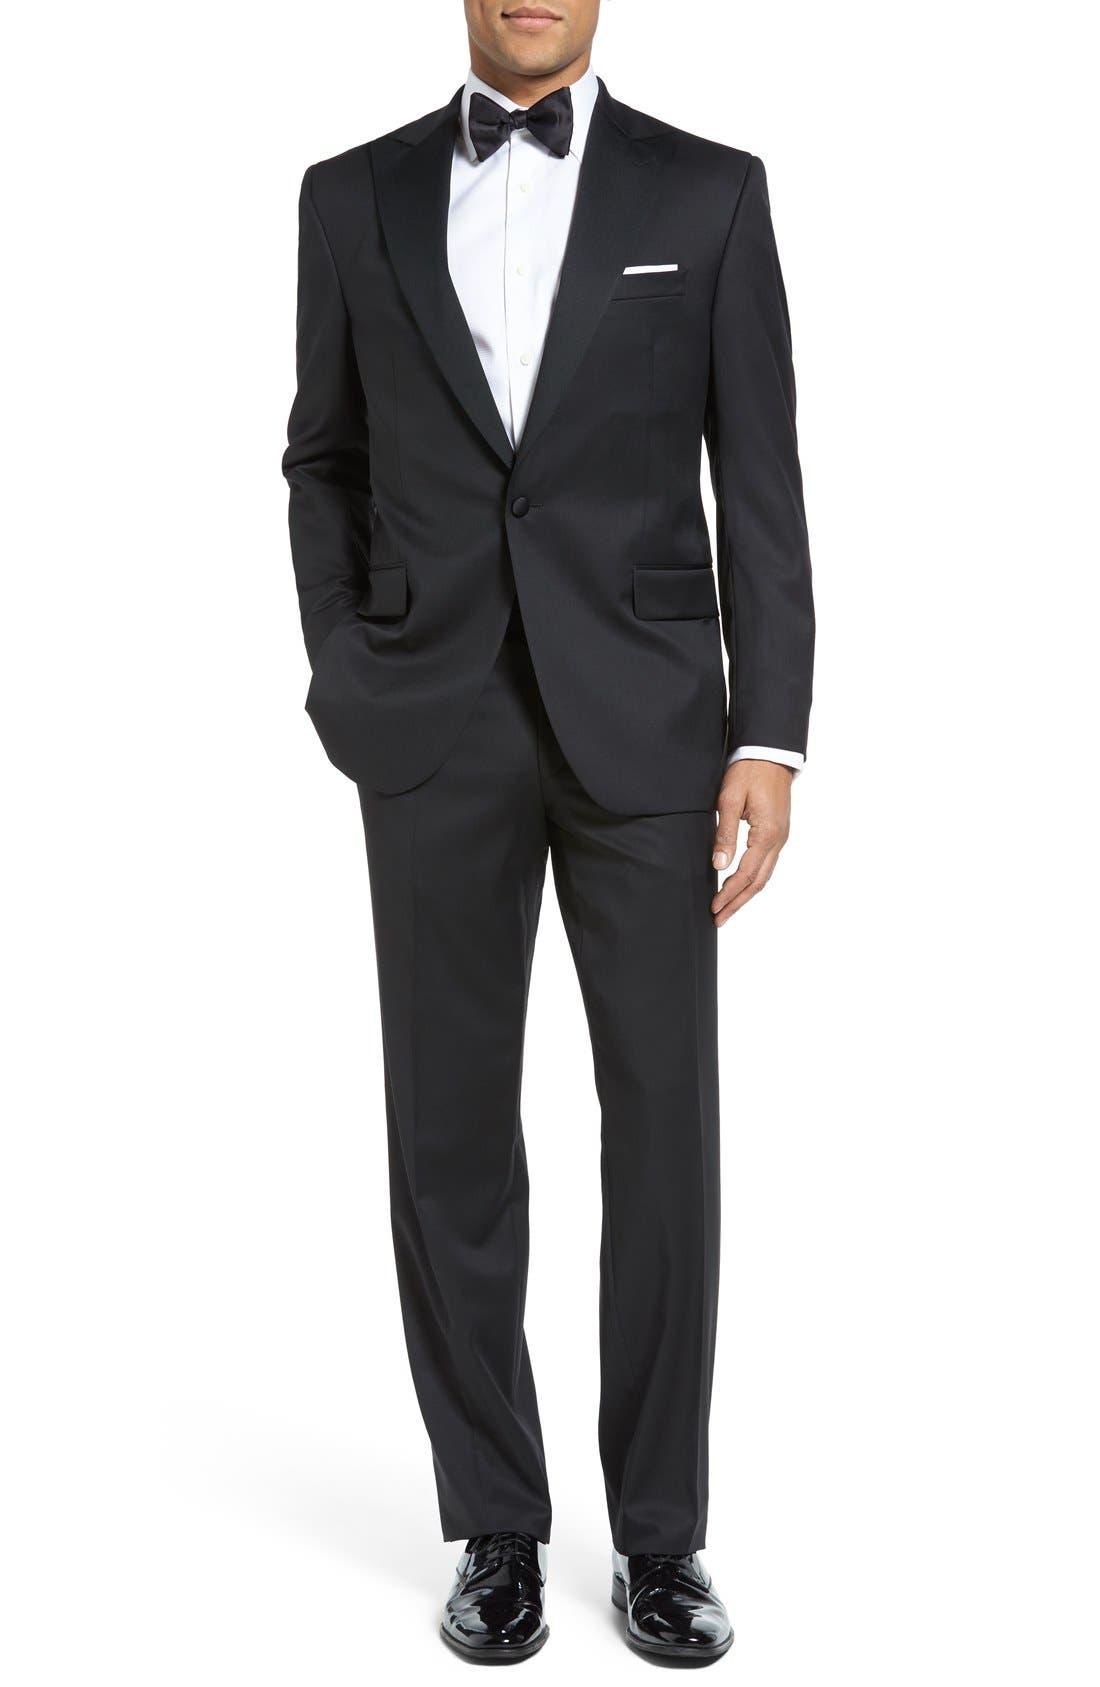 Alternate Image 1 Selected - David Donahue Russell Classic Fit Loro Piana Wool Tuxedo